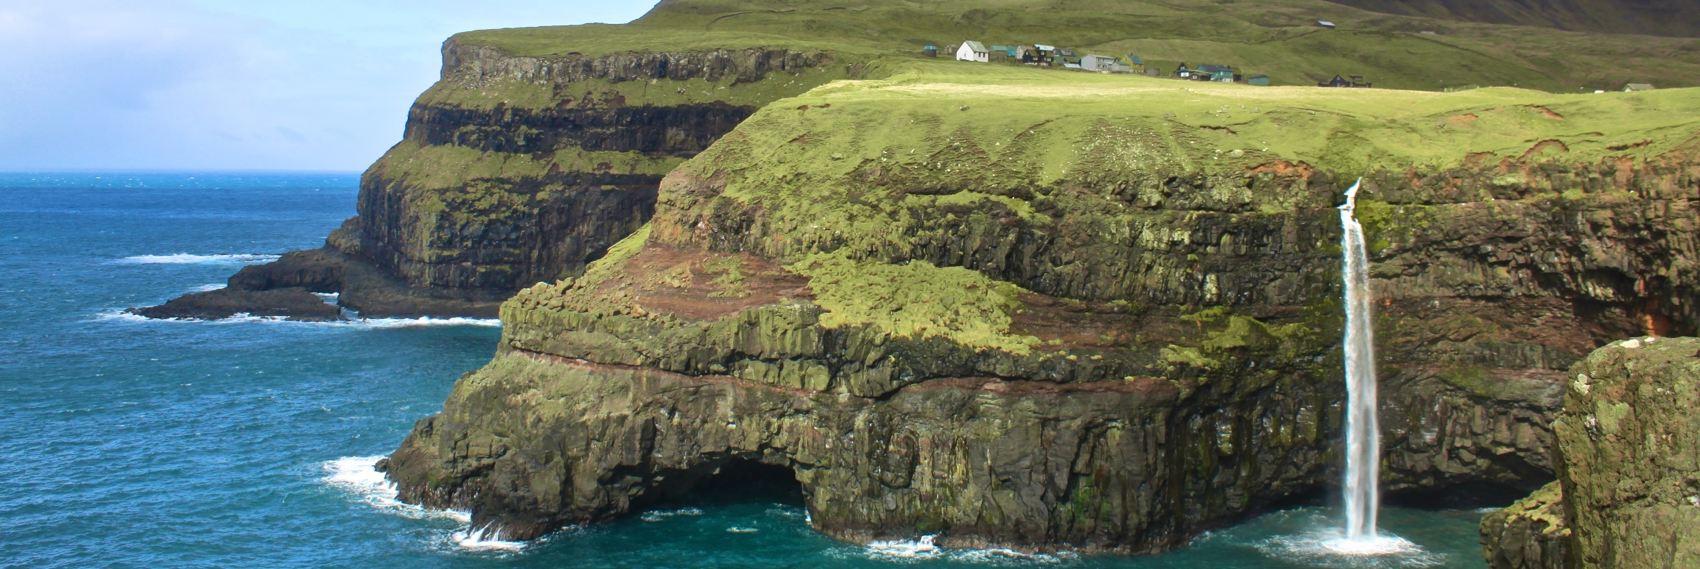 gasadalur-faroe-islands-guesthouse-banner